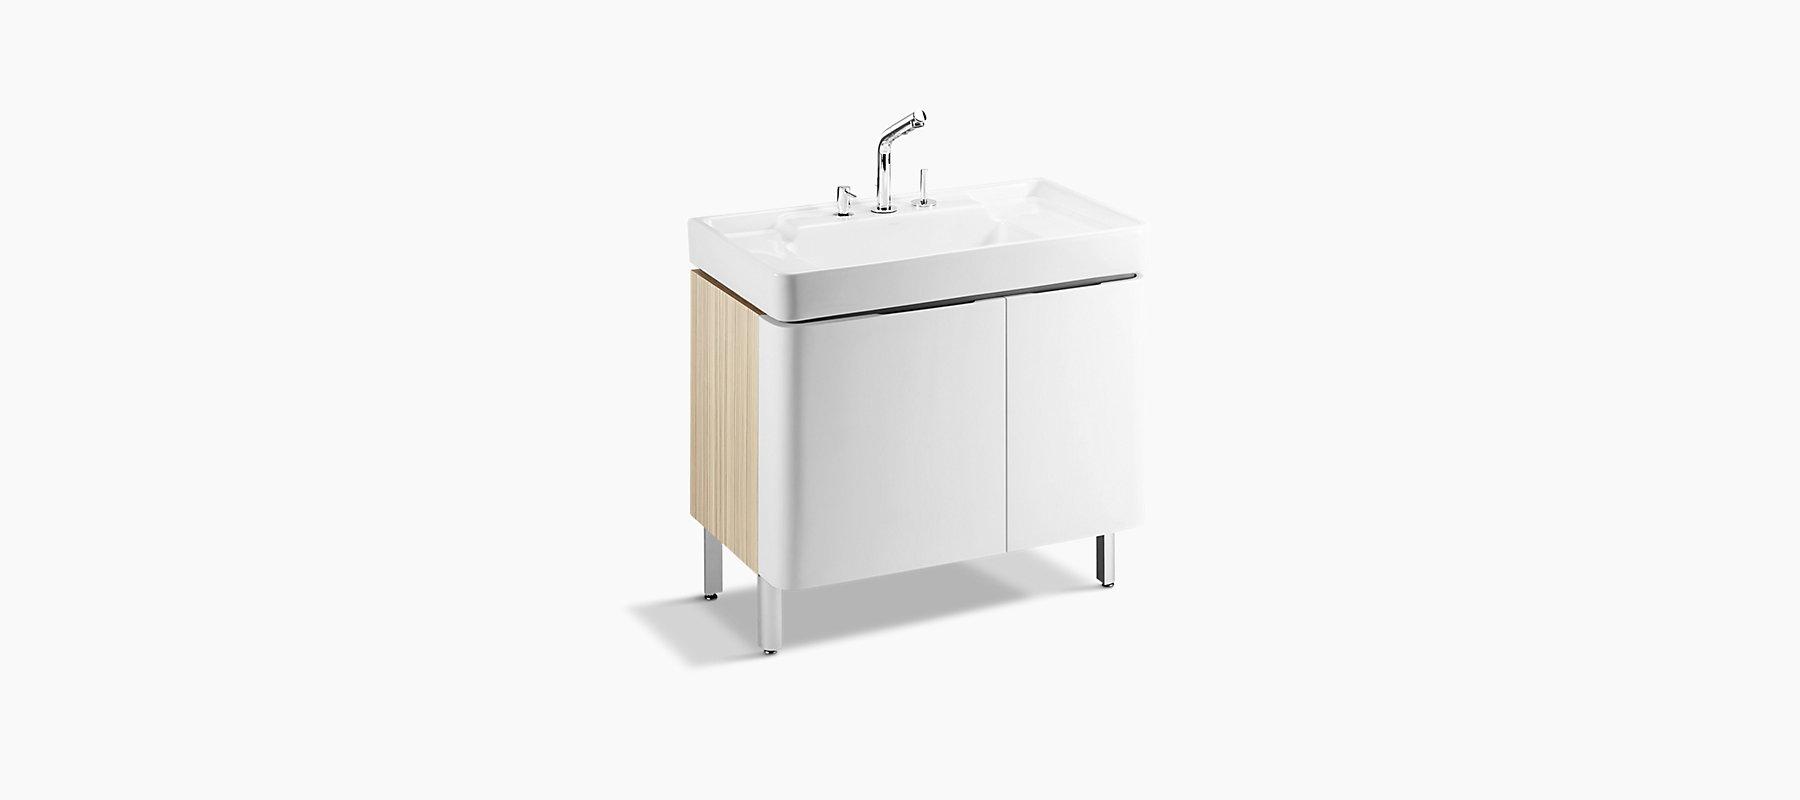 Luxury Bathrooms Amp Designer Kitchens Kohler Singapore